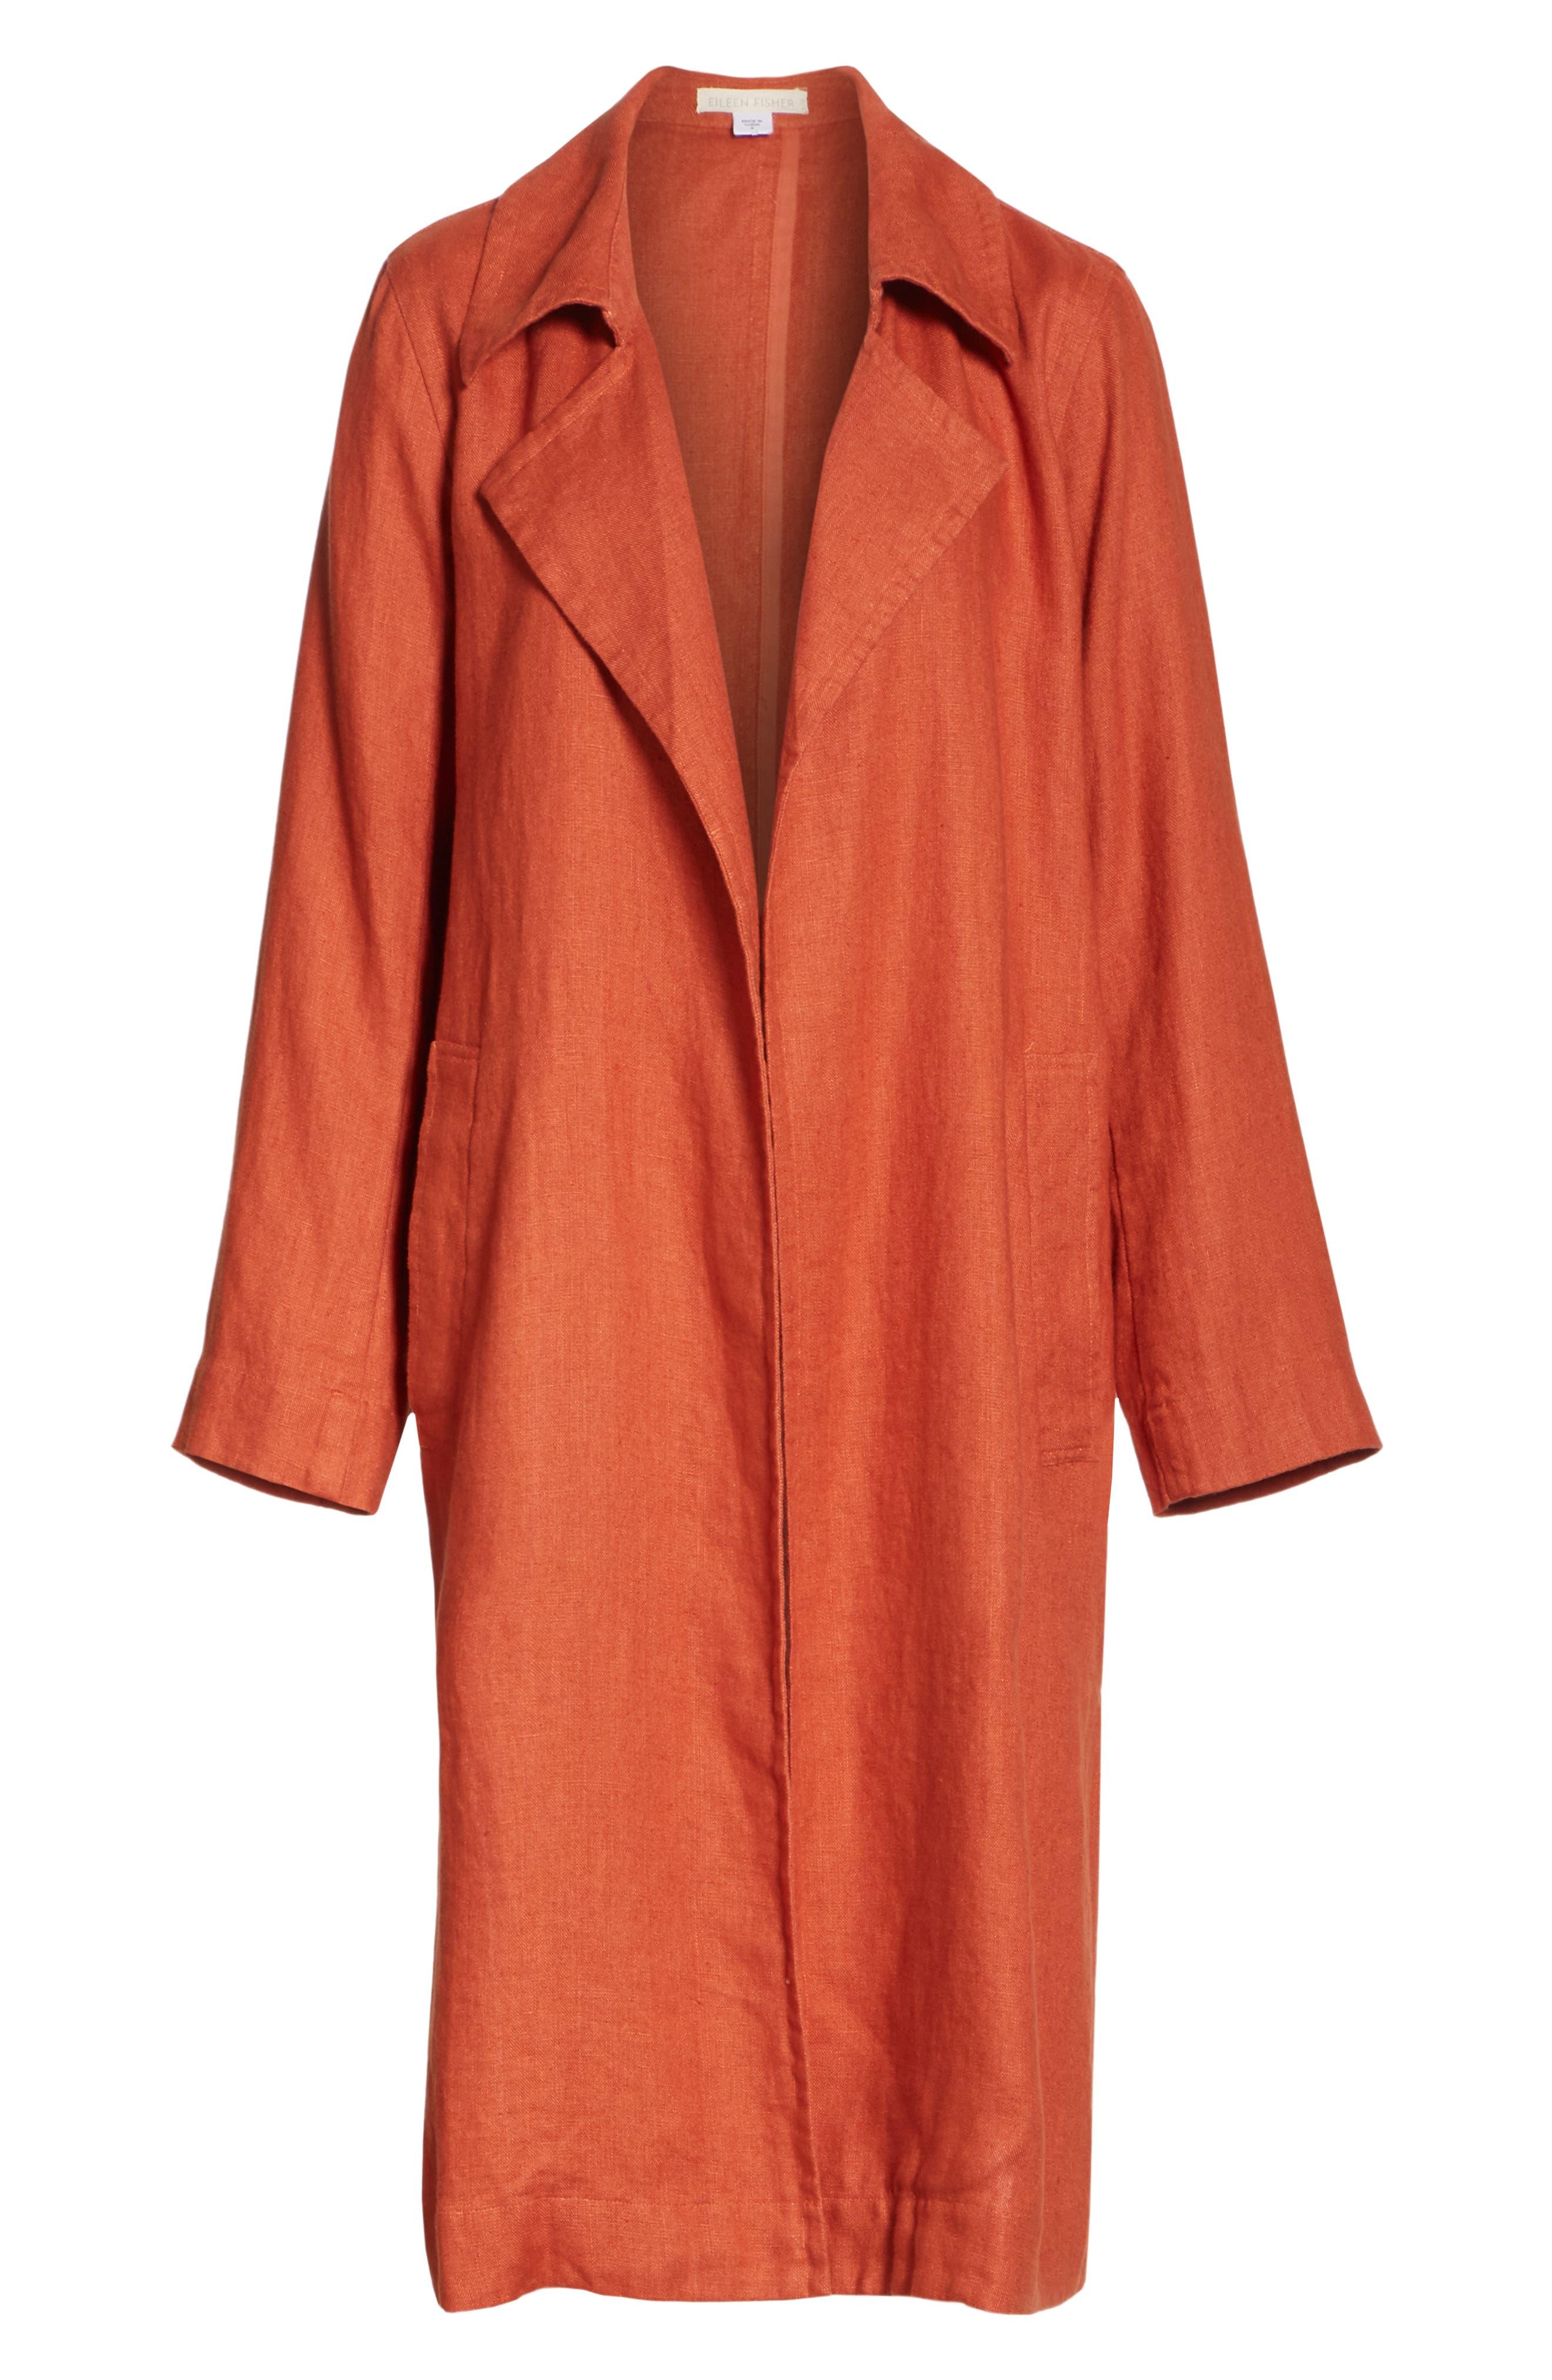 Organic Linen Trench Coat,                             Alternate thumbnail 5, color,                             822